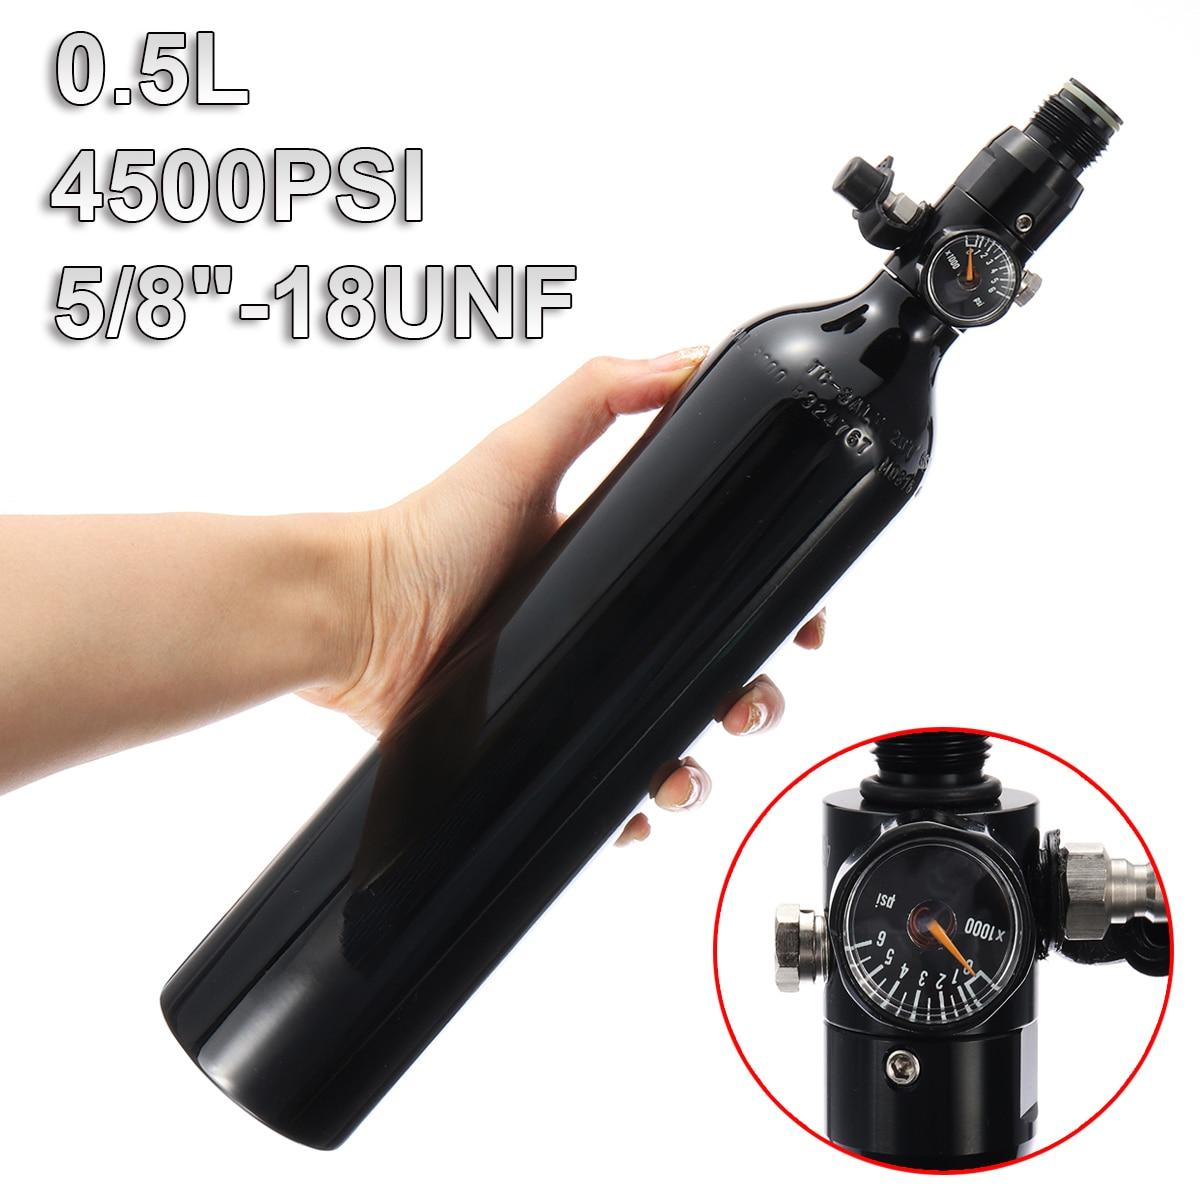 Paintball PCP Zylinder Tank 4500psi 0,5 L Hohe Druckluft Flasche W/Regler